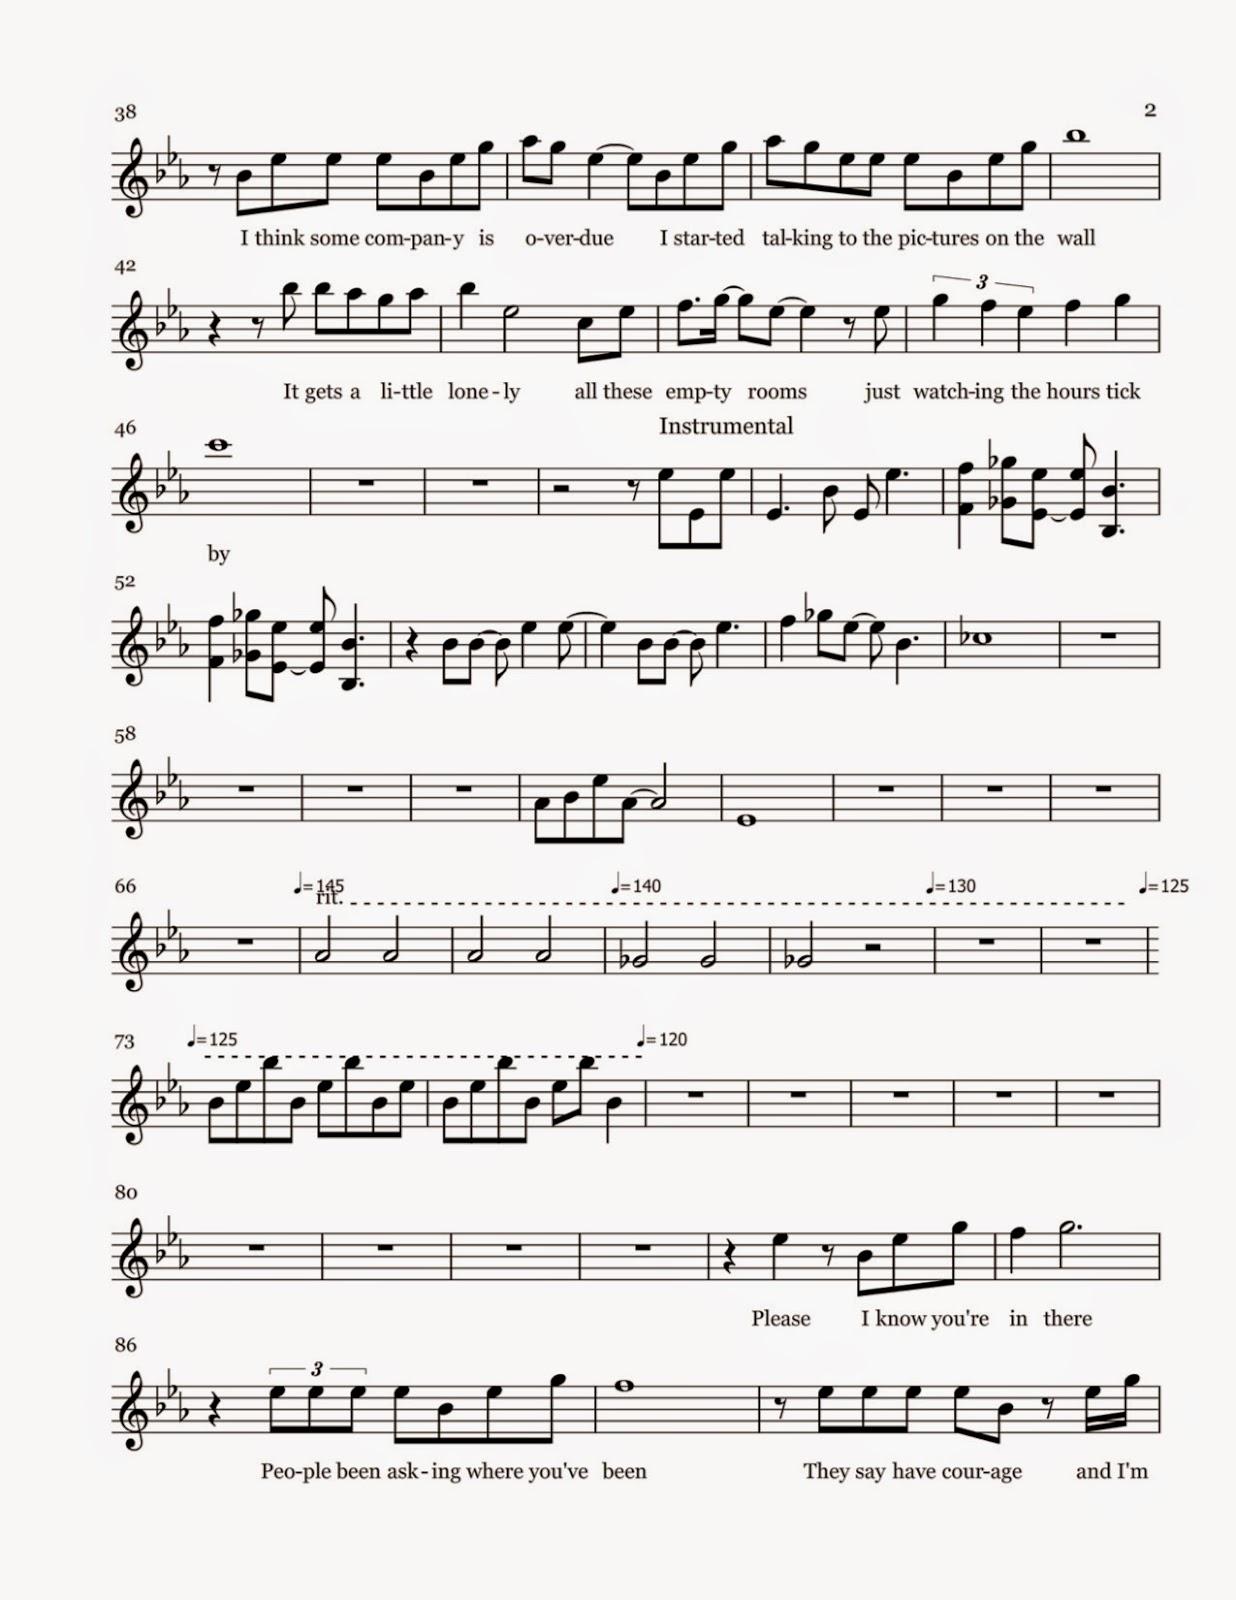 Flute Sheet Music: Do You Want To Build A Snowman - Sheet Music